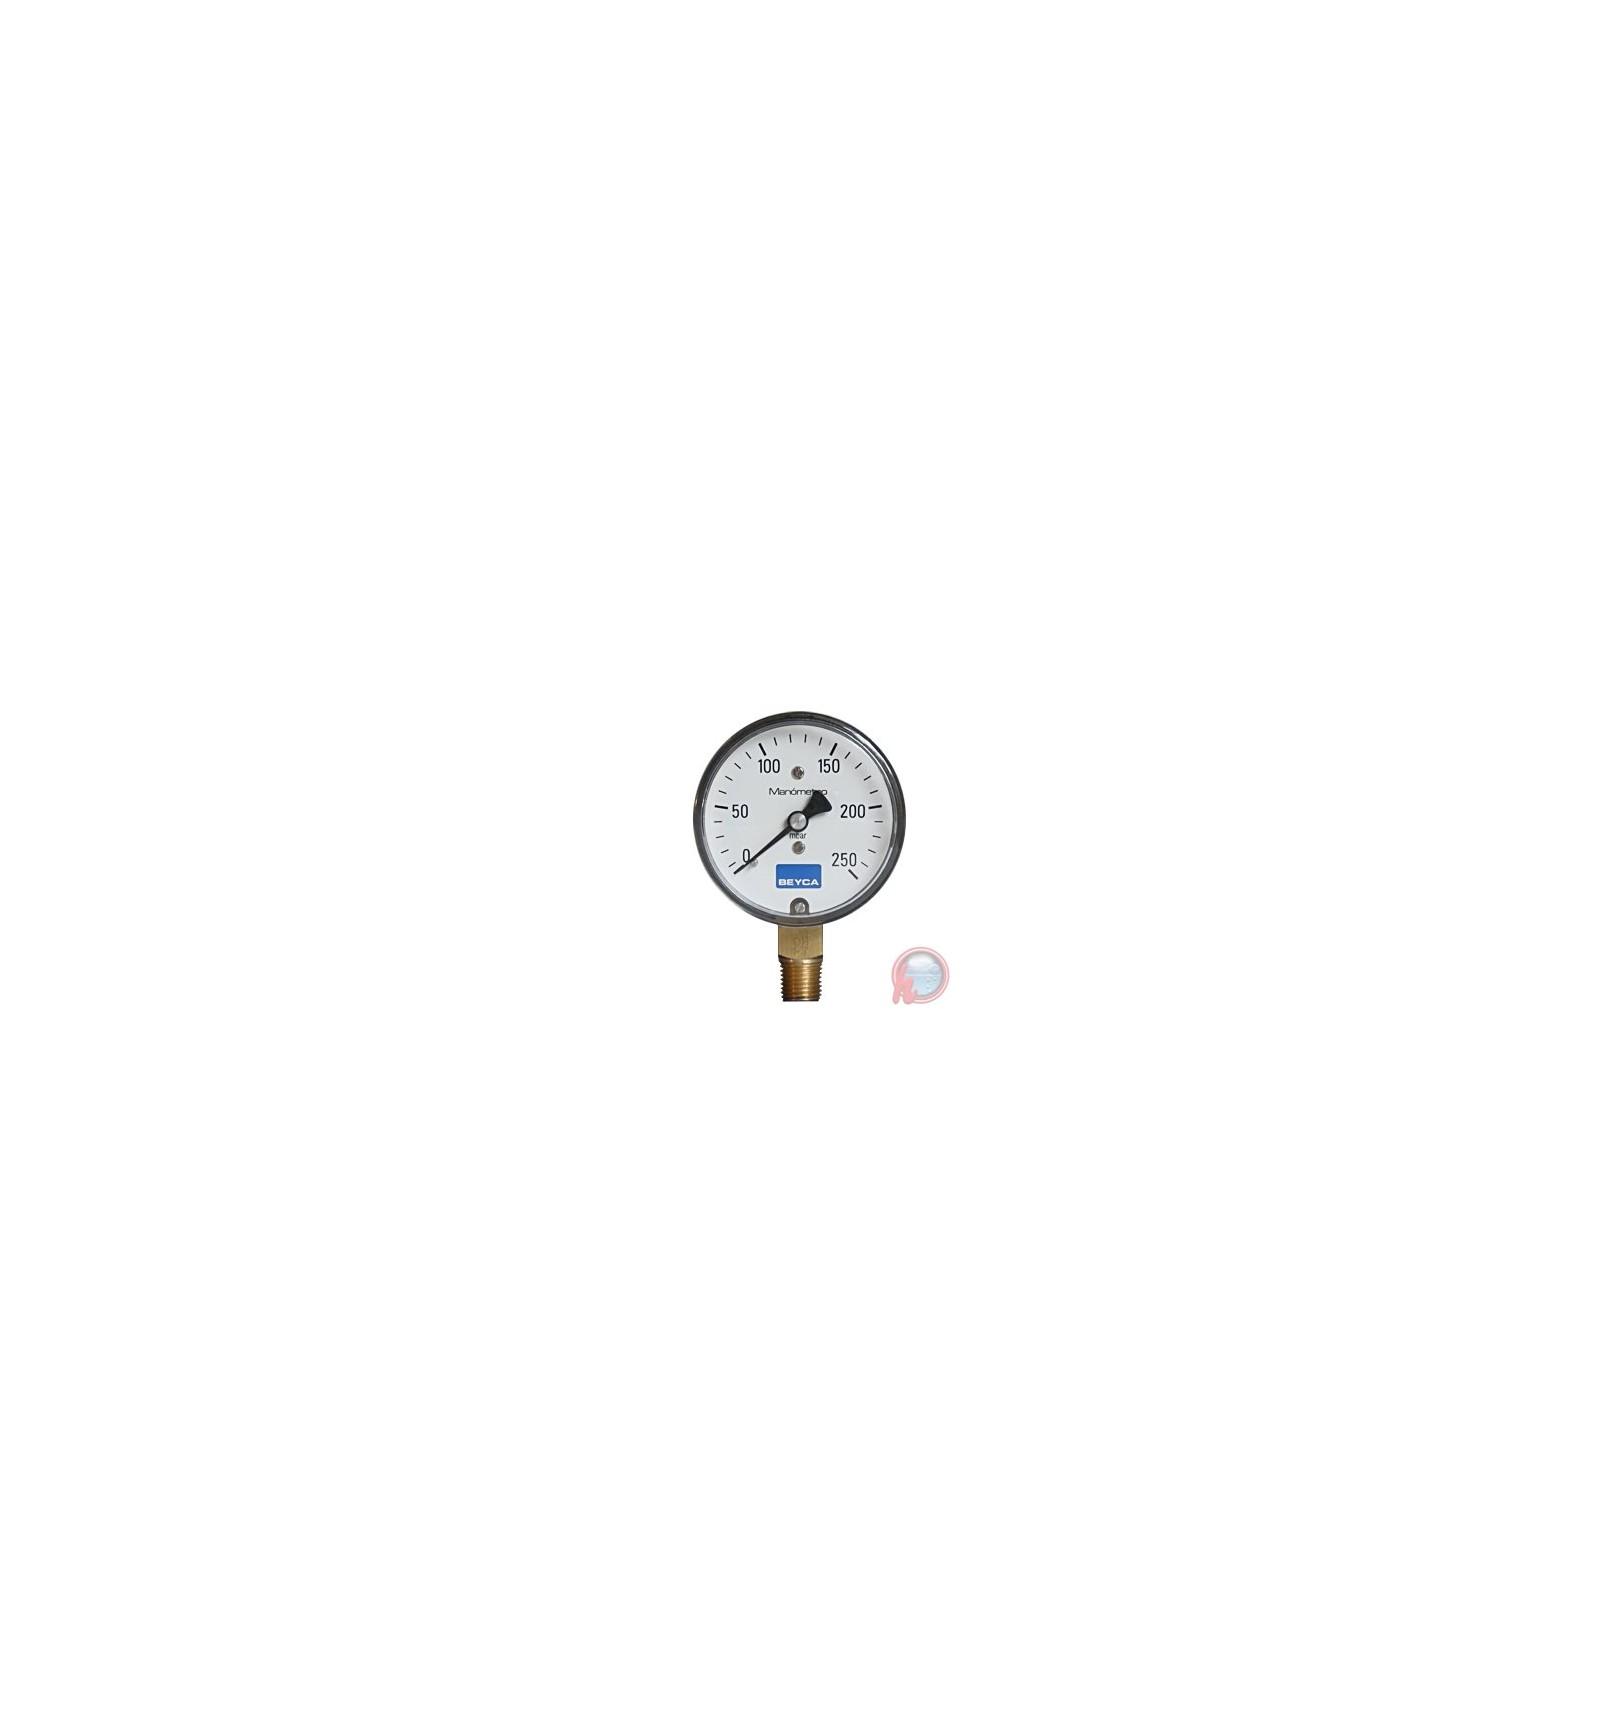 Manometro baja presion aplicaci n gas 63 mm 60 mbar beyca for Manometro para medir presion de agua